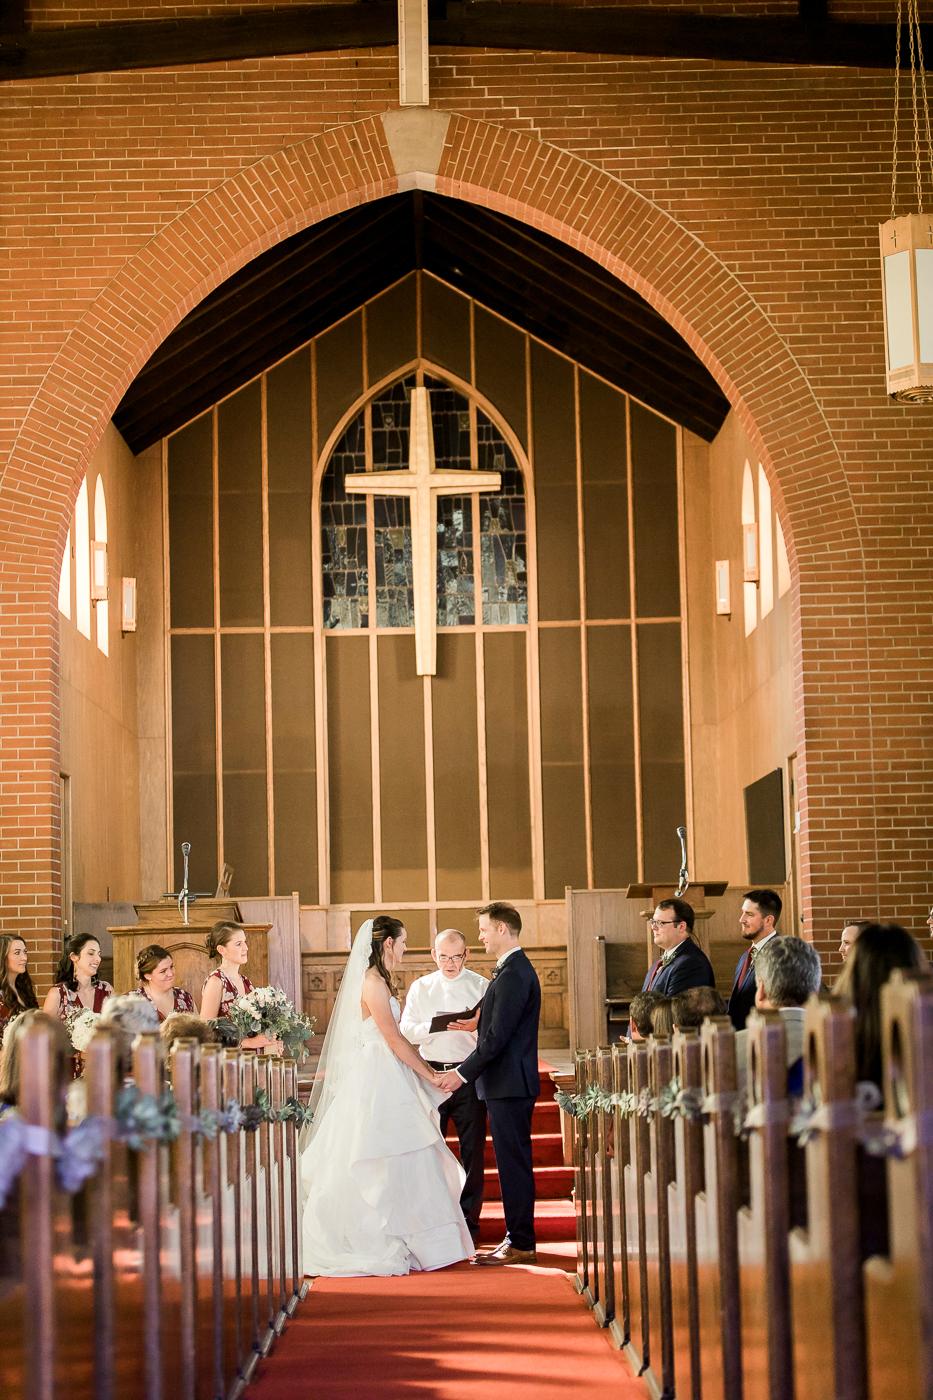 Ruthie & Erik   Denver Botanic Garden Wedding - Megan Lee Photography